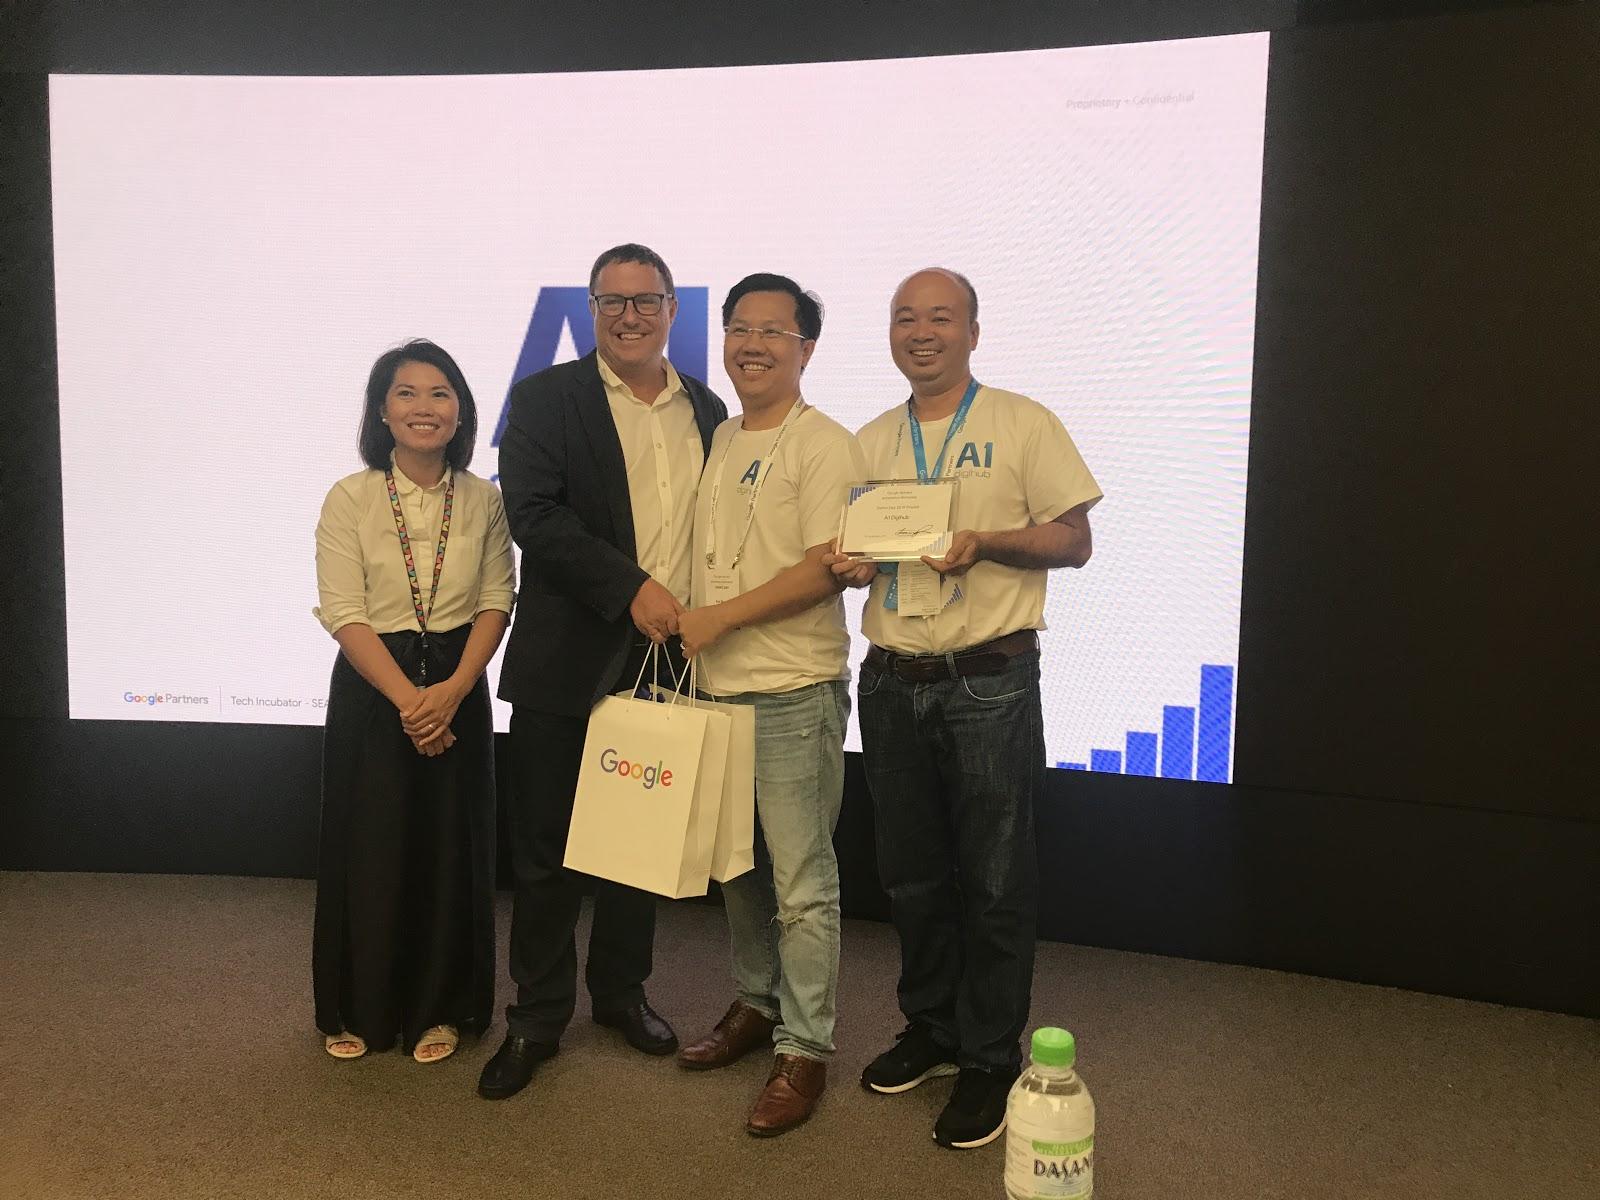 A1-digihub-Google-Partner-in-Viet-Nam